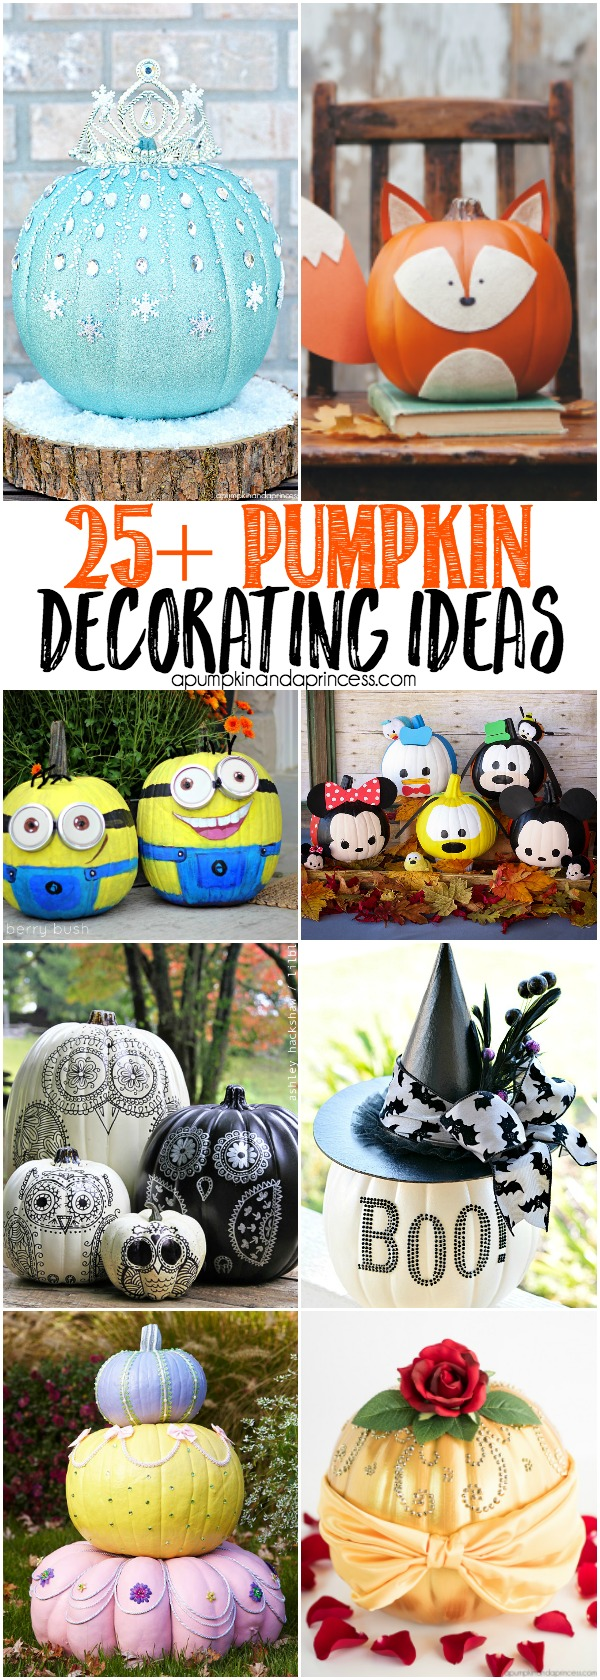 25 Creative Pumpkin Decorating Ideas